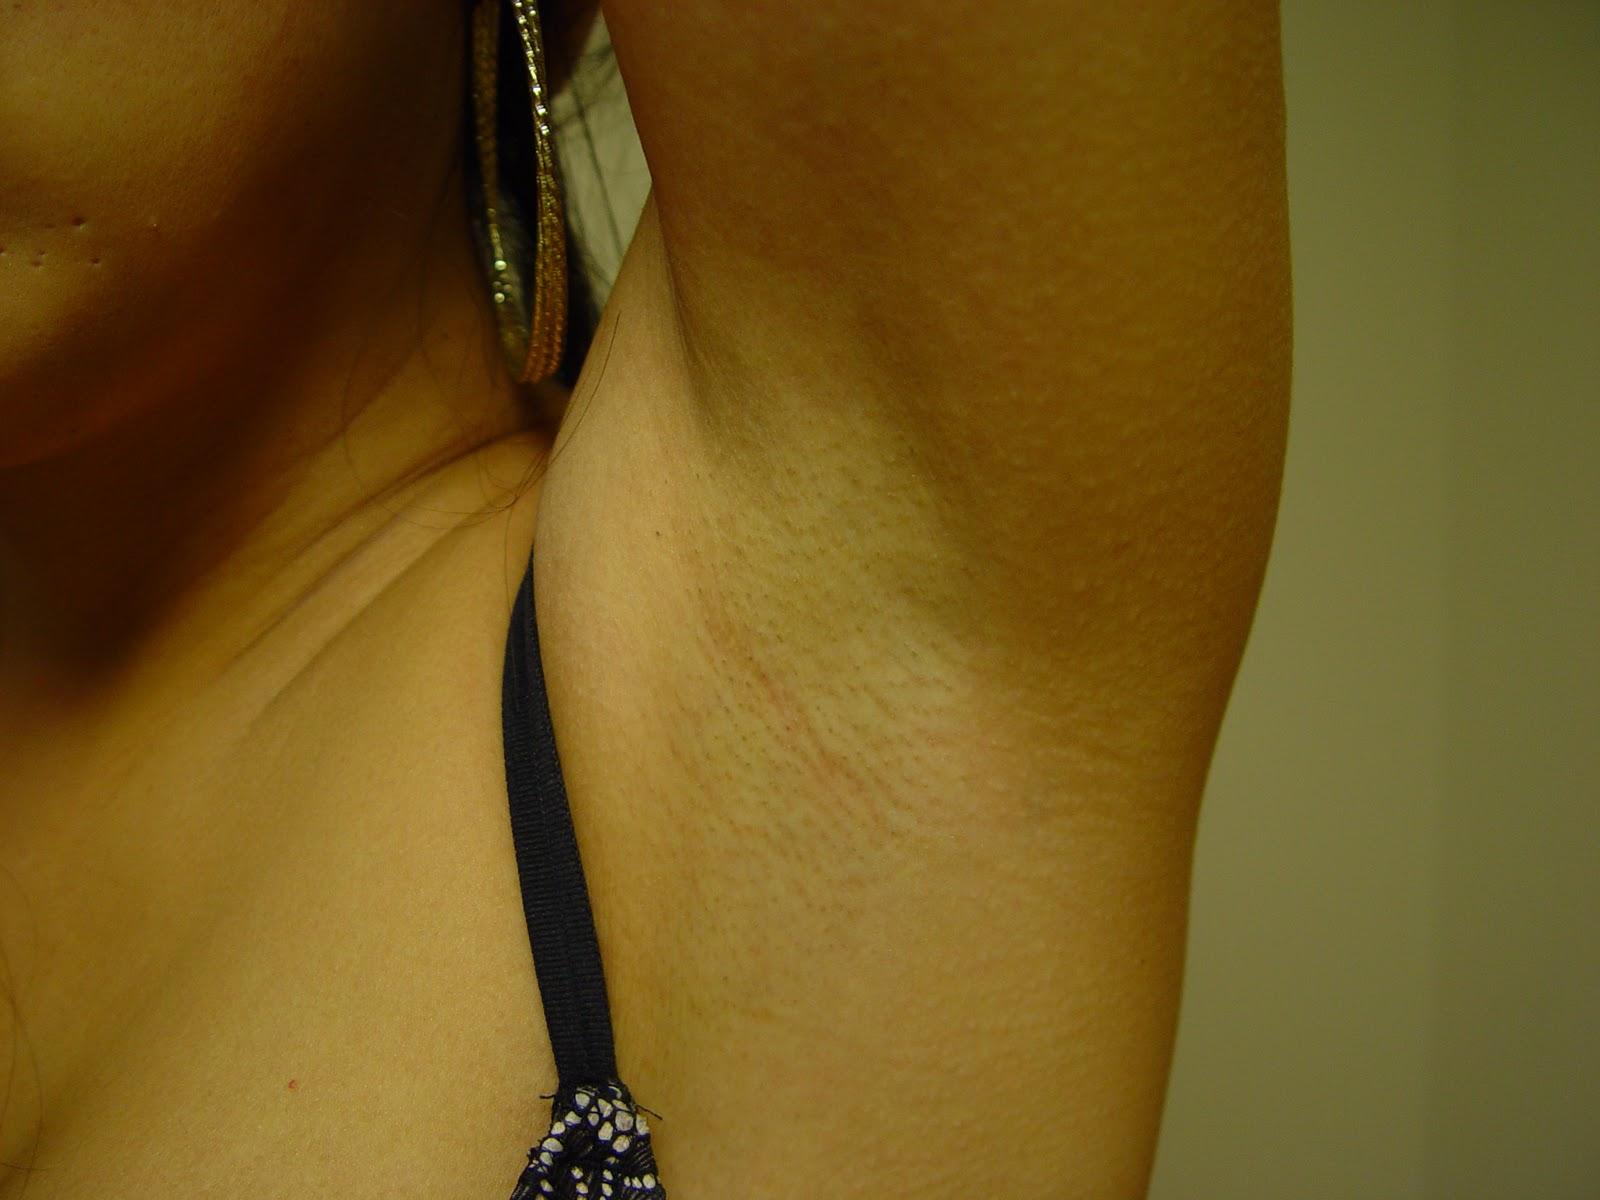 breast augmentation scars photos jpg 1152x768